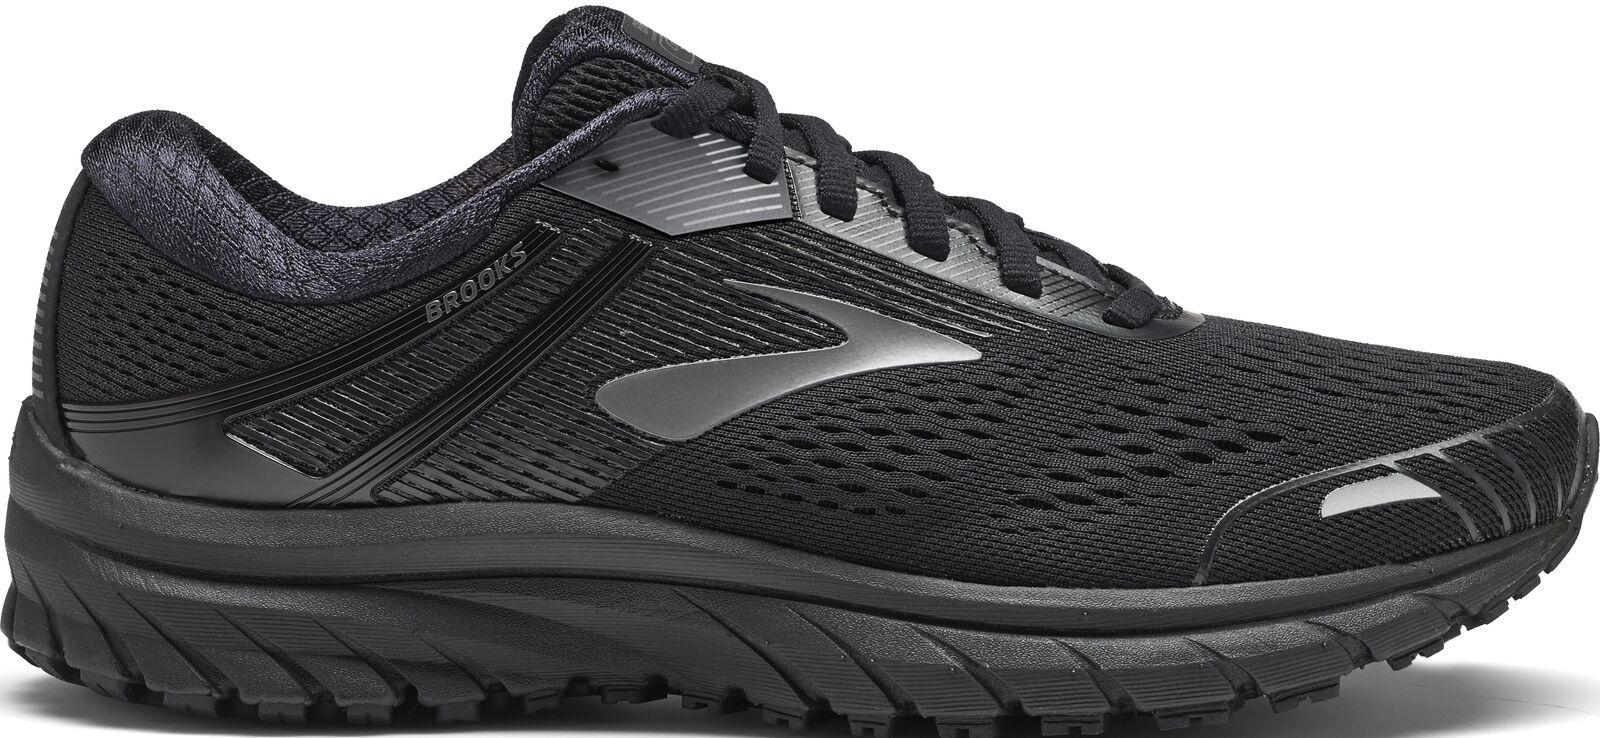 Brooks Adrenaline GTS 18  donna Running scarpe nero Structed Support Trainers  consegna gratuita